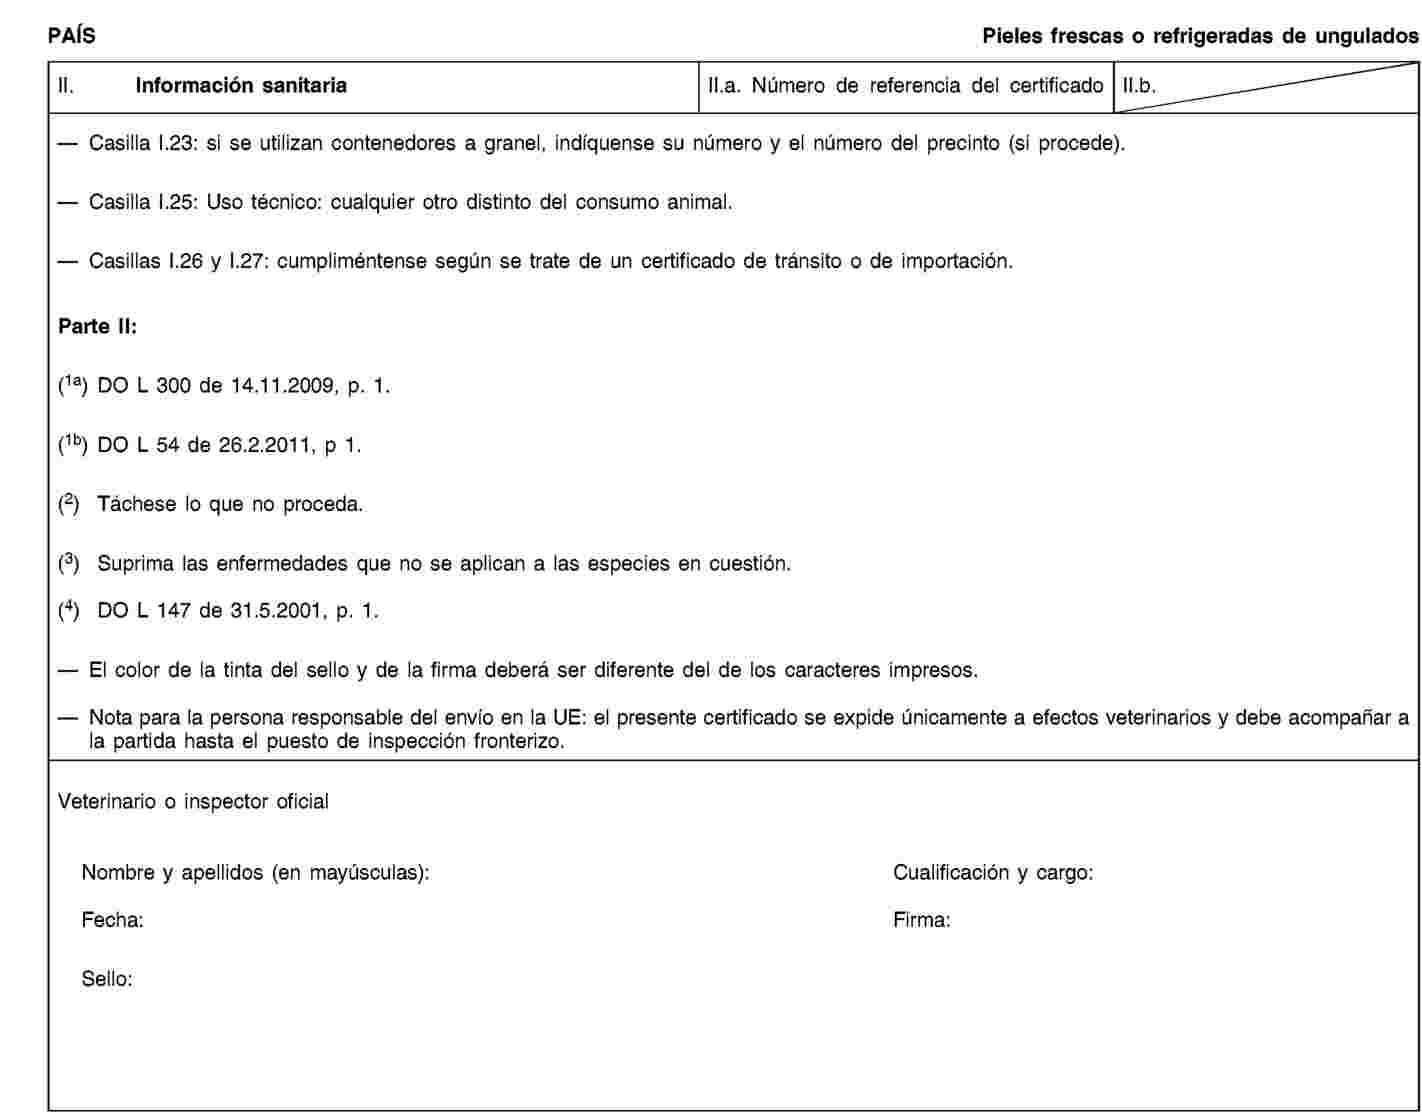 Imagen: https://eur-lex.europa.eu/resource.html?uri=uriserv:OJ.L_.2011.054.01.0001.01.SPA.xhtml.L_2011054ES.01017801.tif.jpg